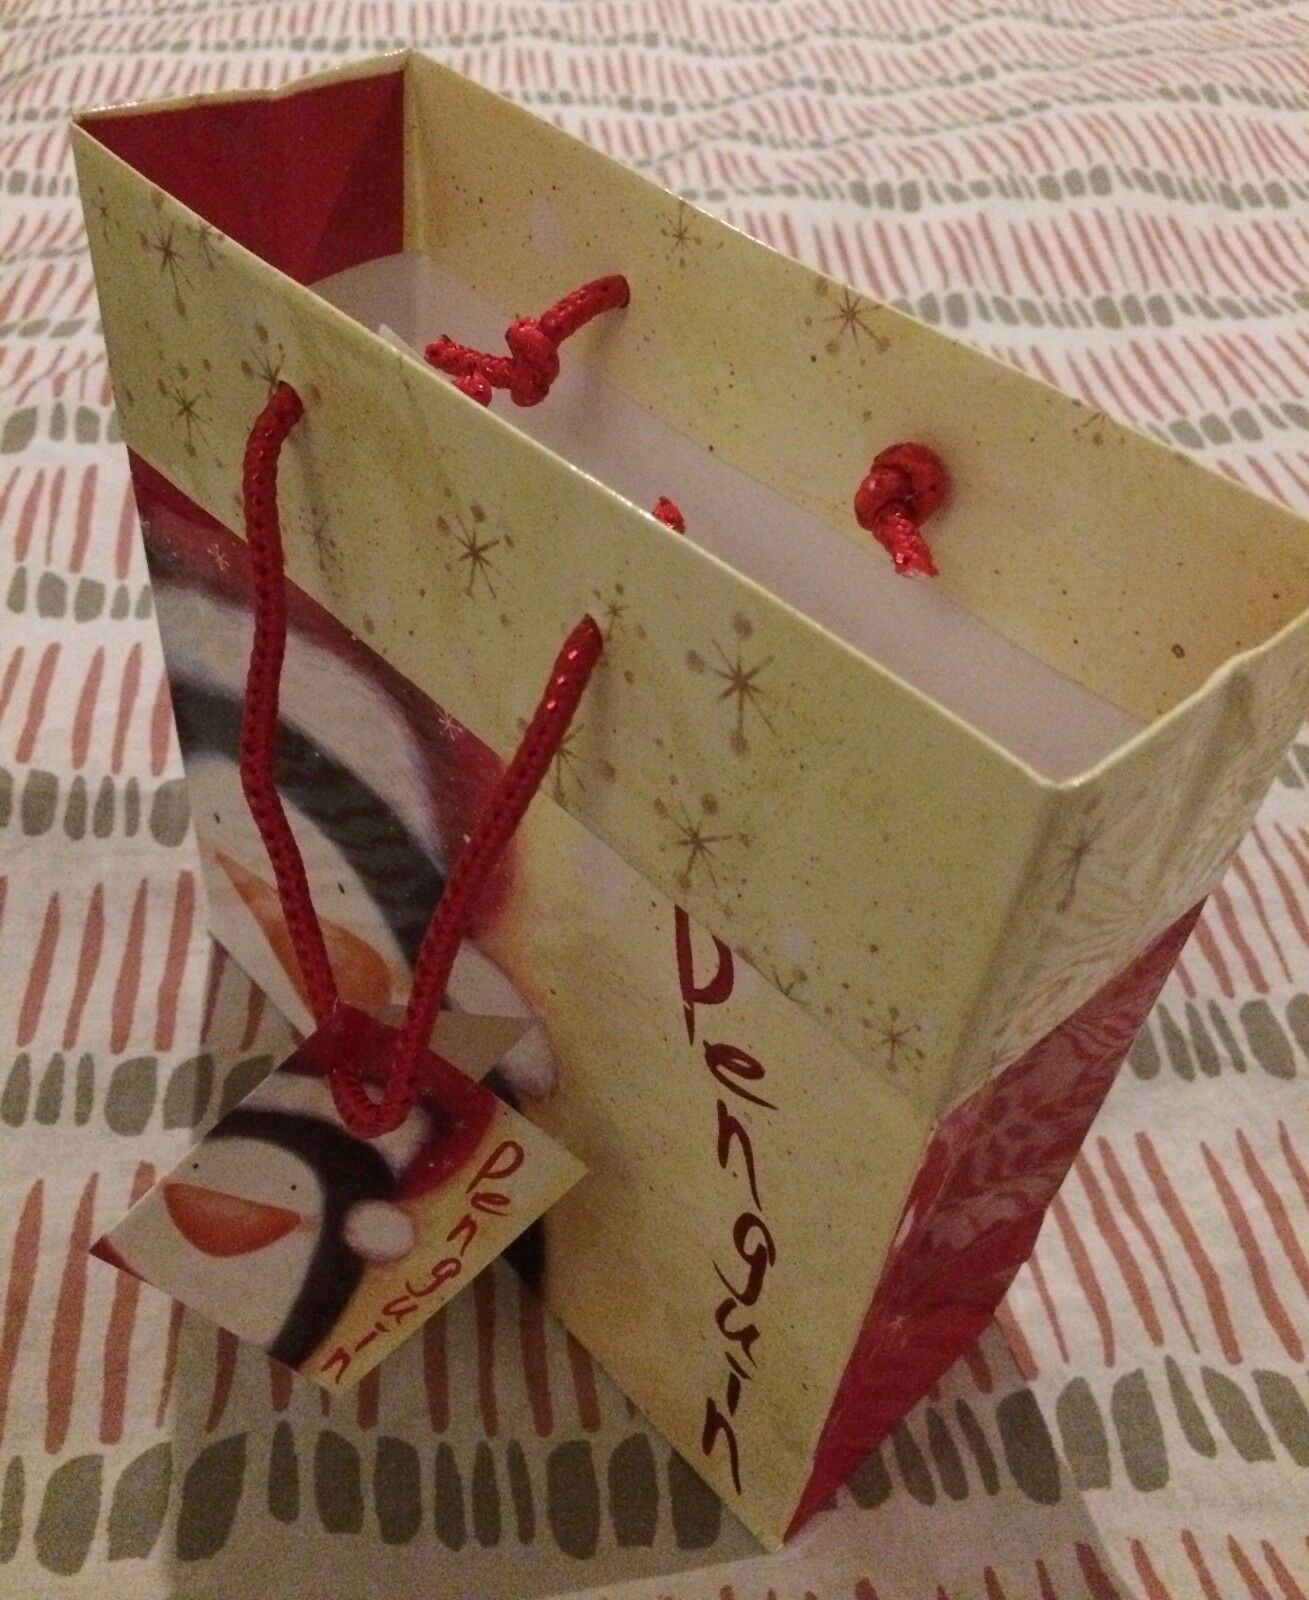 Christmas Present Gift Bag Santa Penguin Design with Tag Tag Tag Presents Gifts 7  x 7  088127